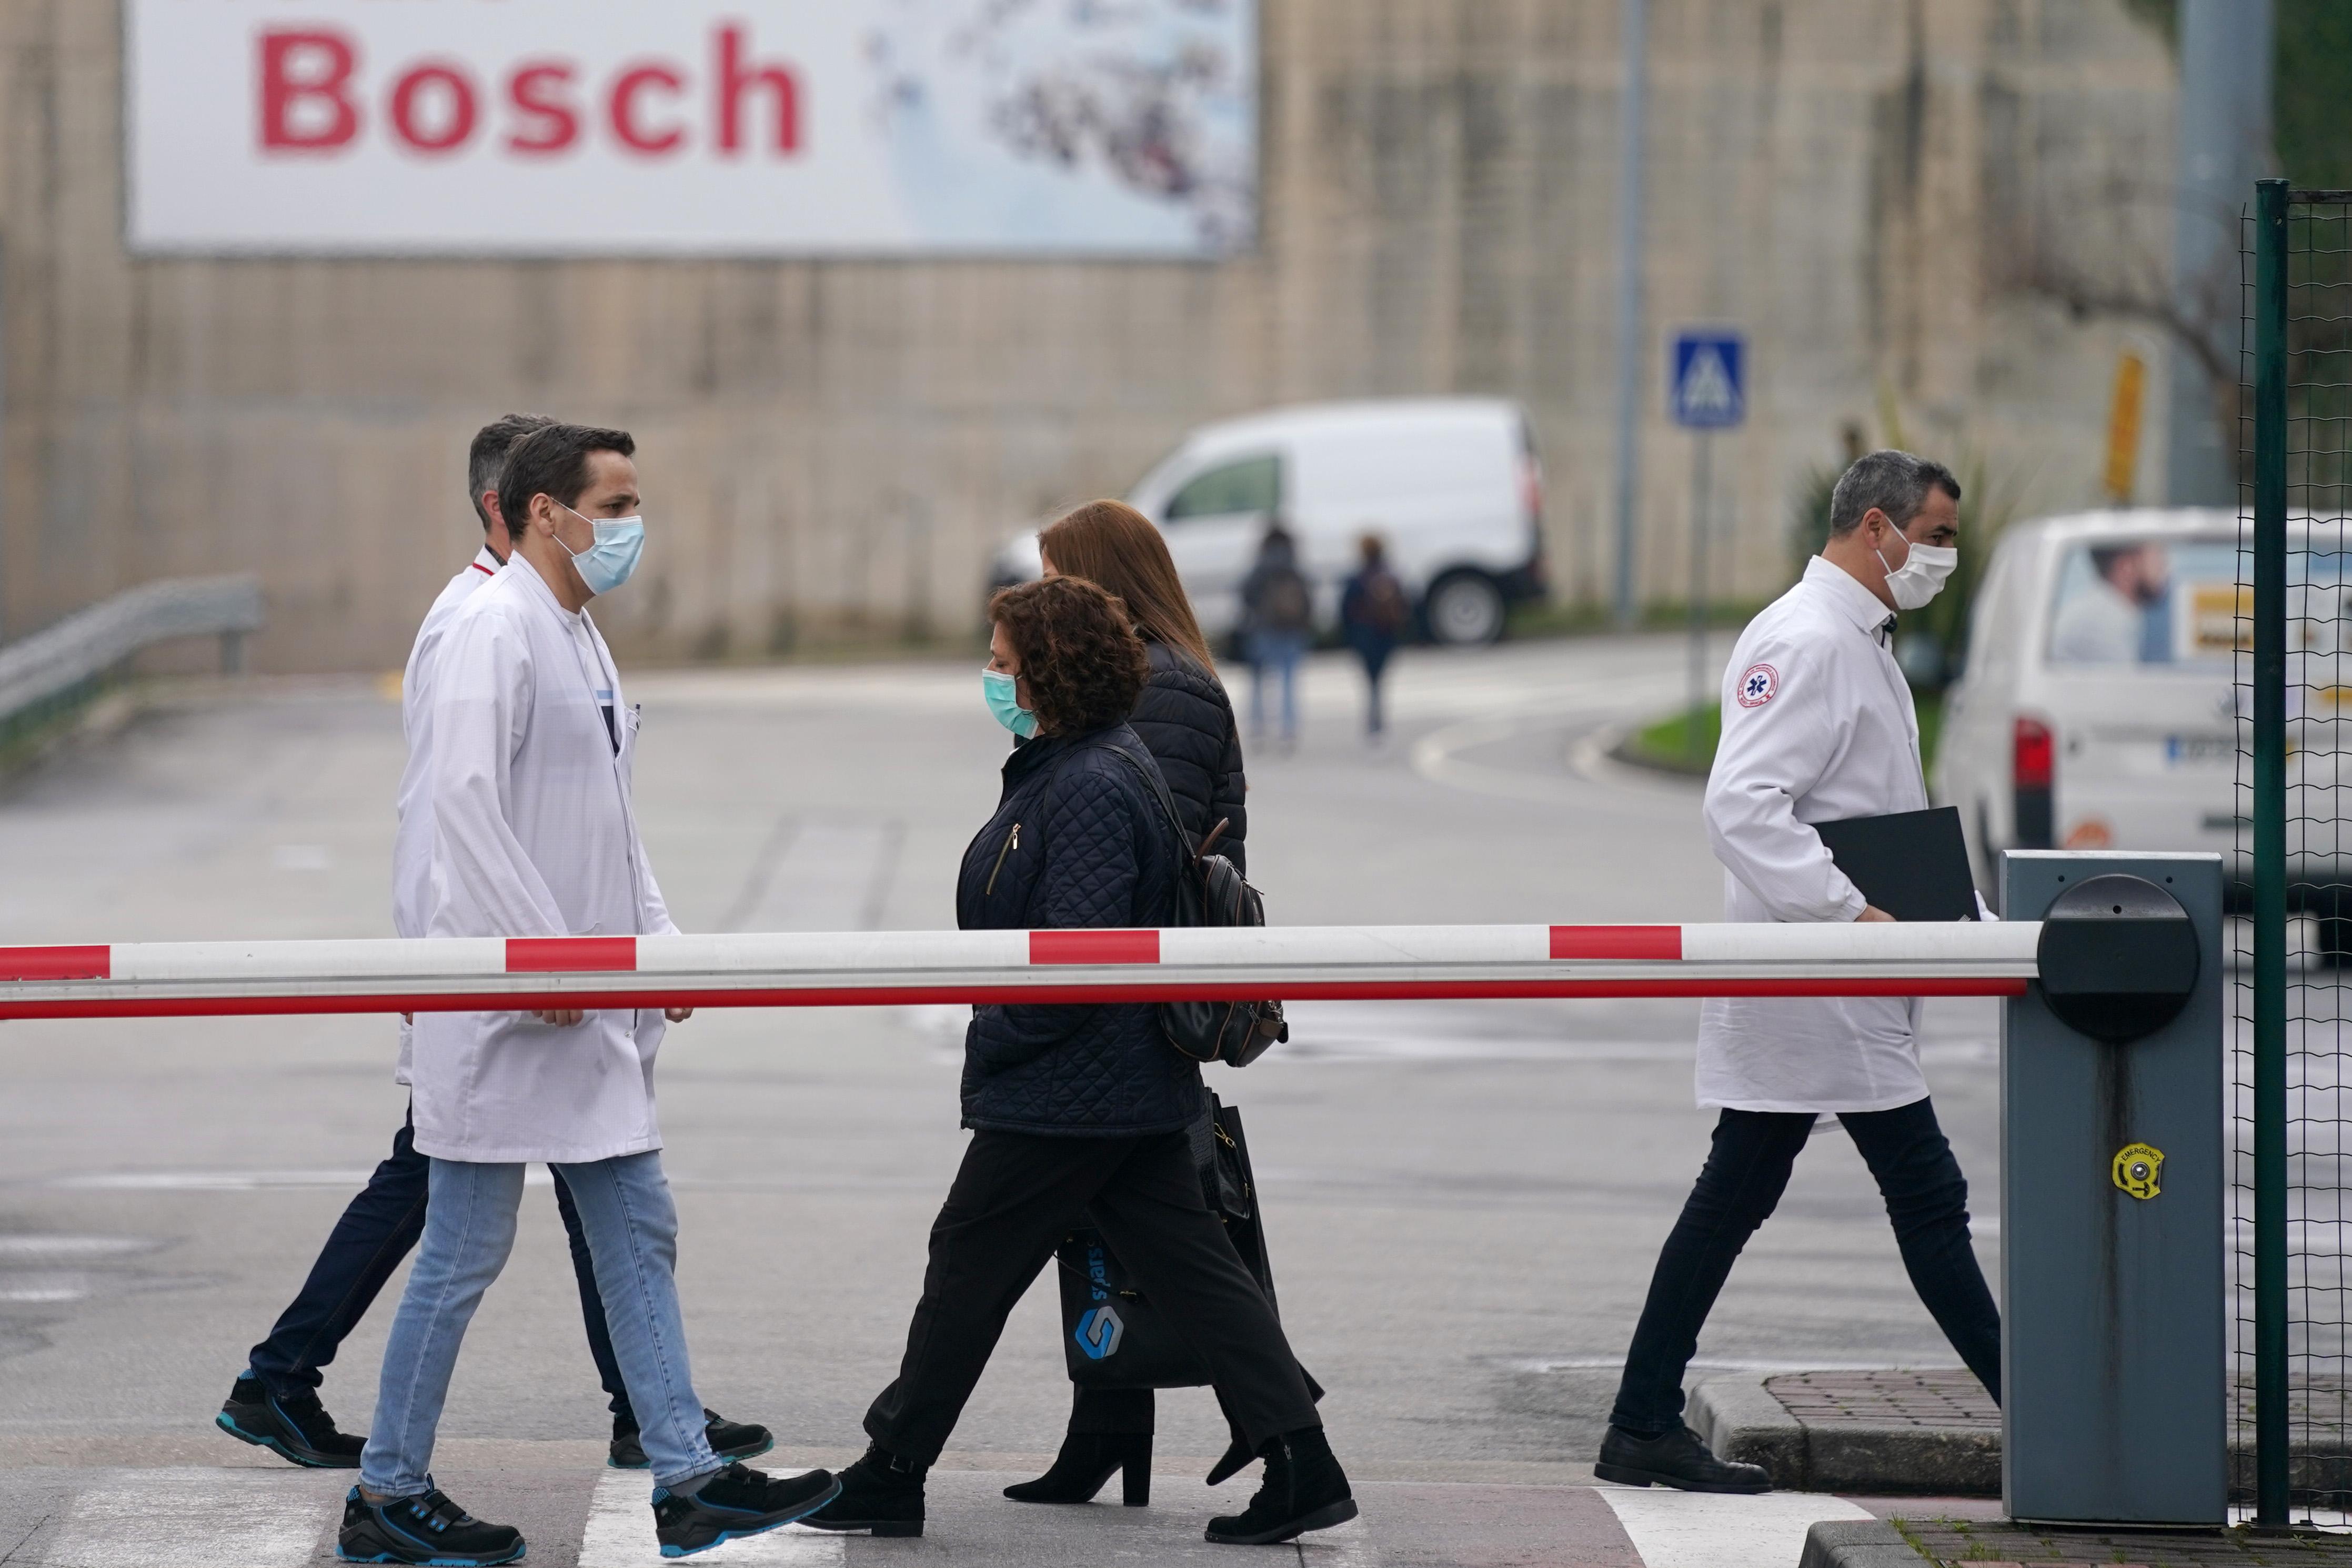 Trabalhadores da Bosch. Foto de Hugo Delgado, Lusa.